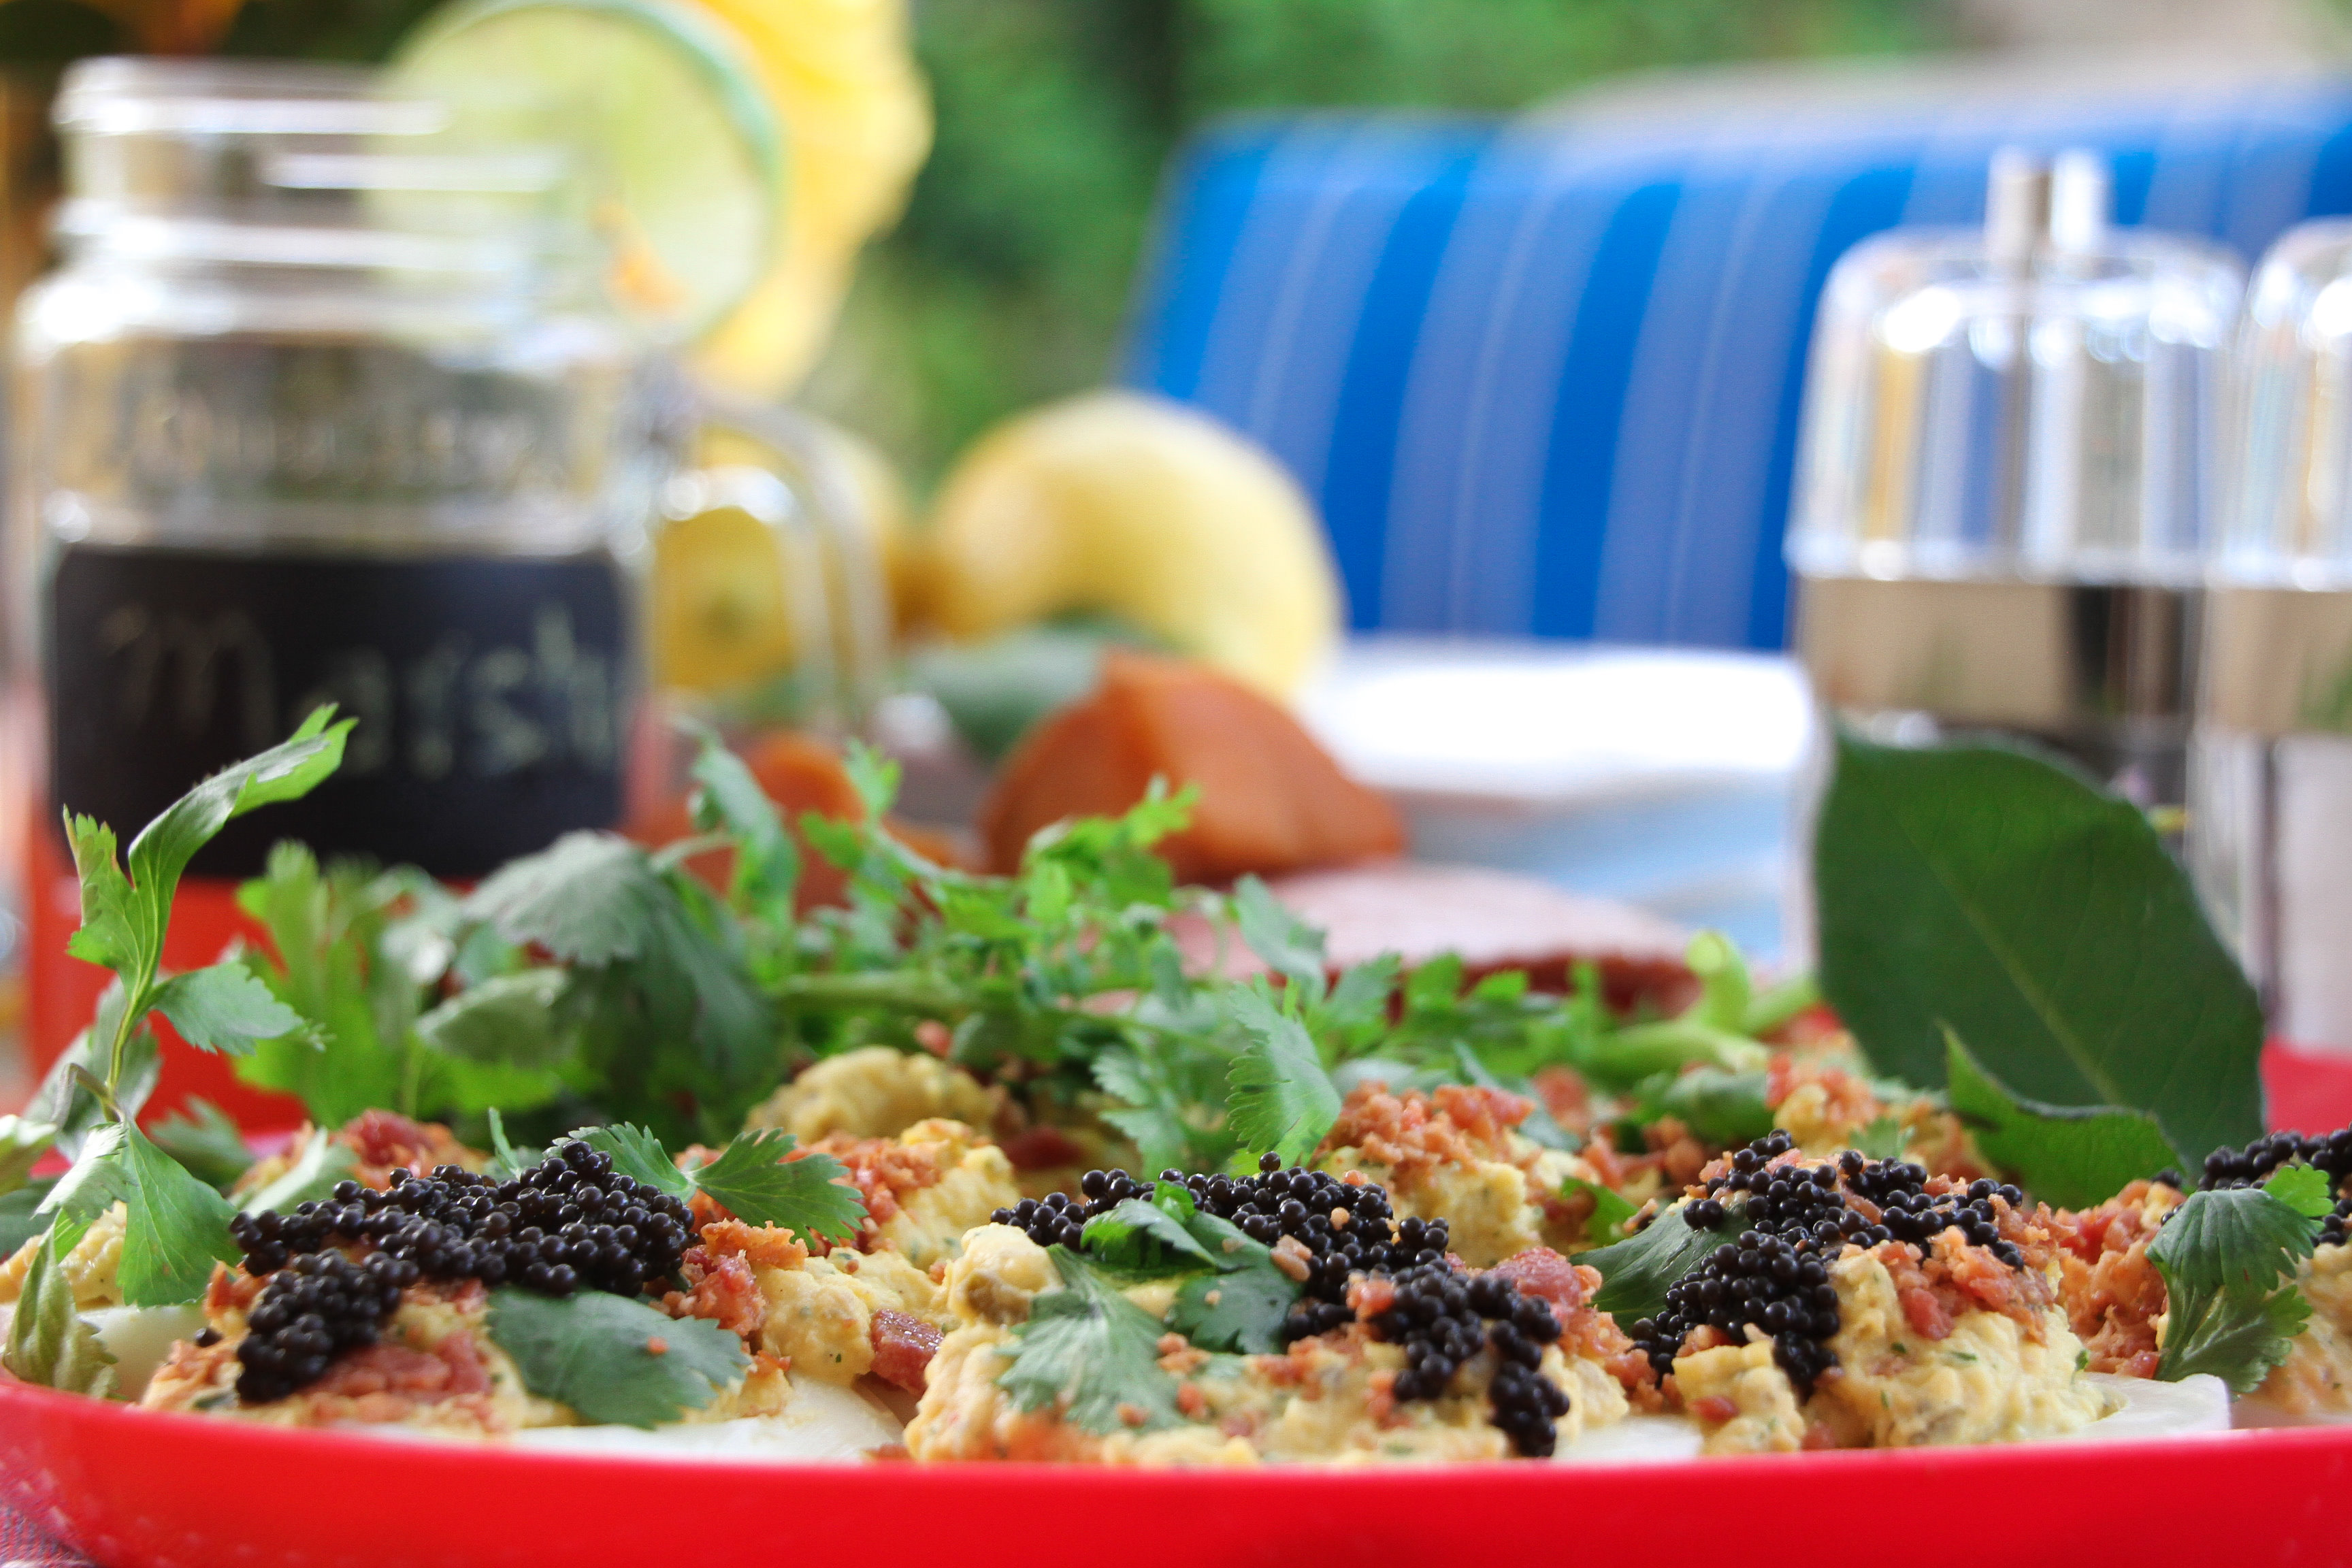 Food Caviar _Garnish_Wine_alfresco_patio